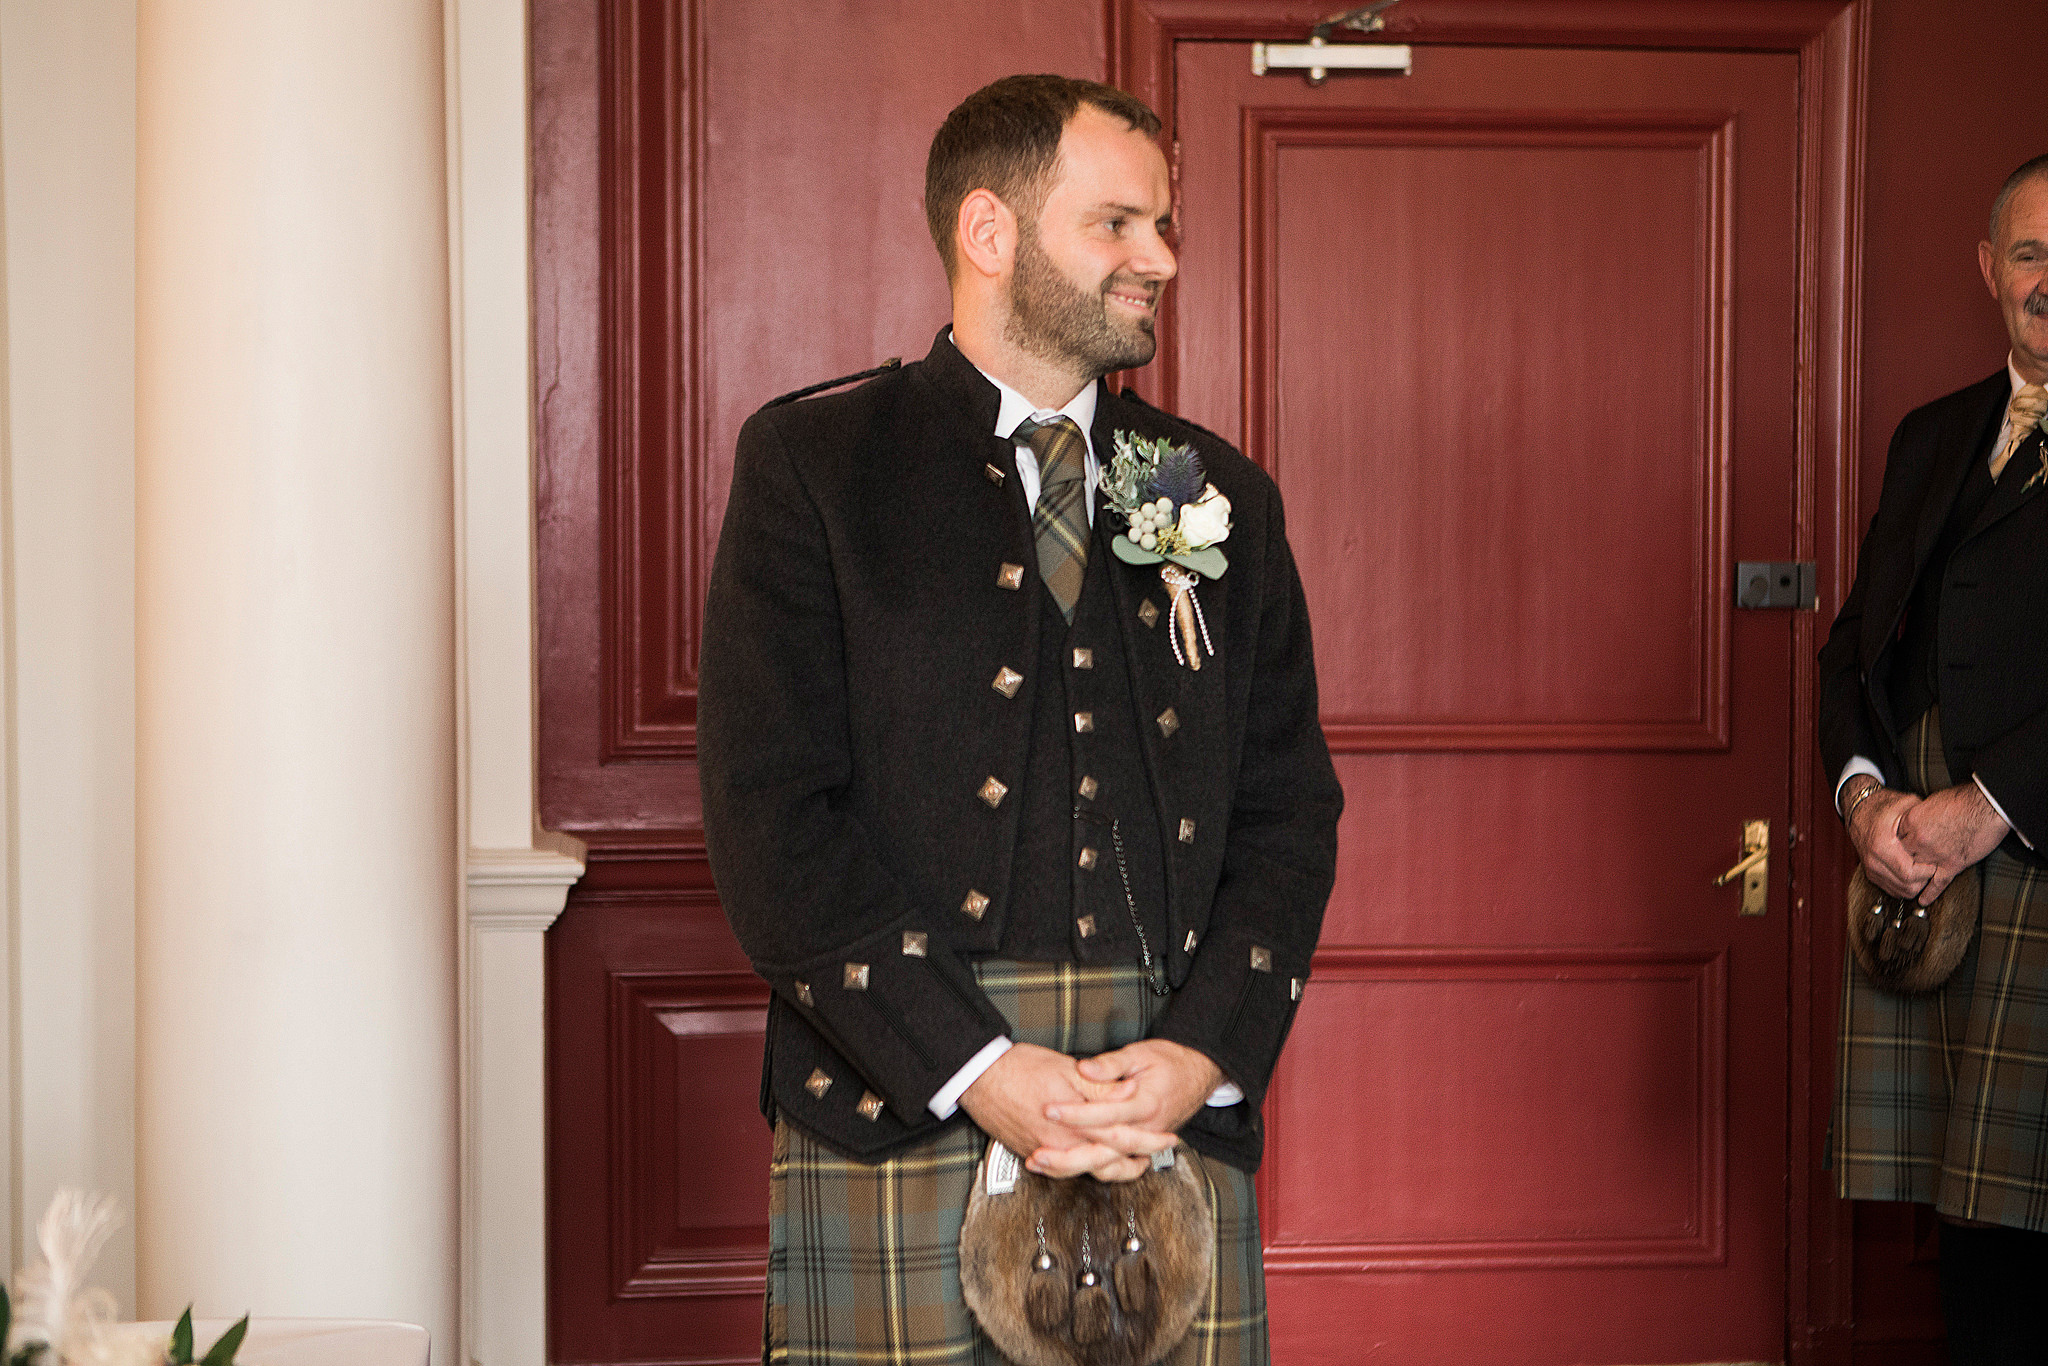 069-wedding-photography-peebles.jpg